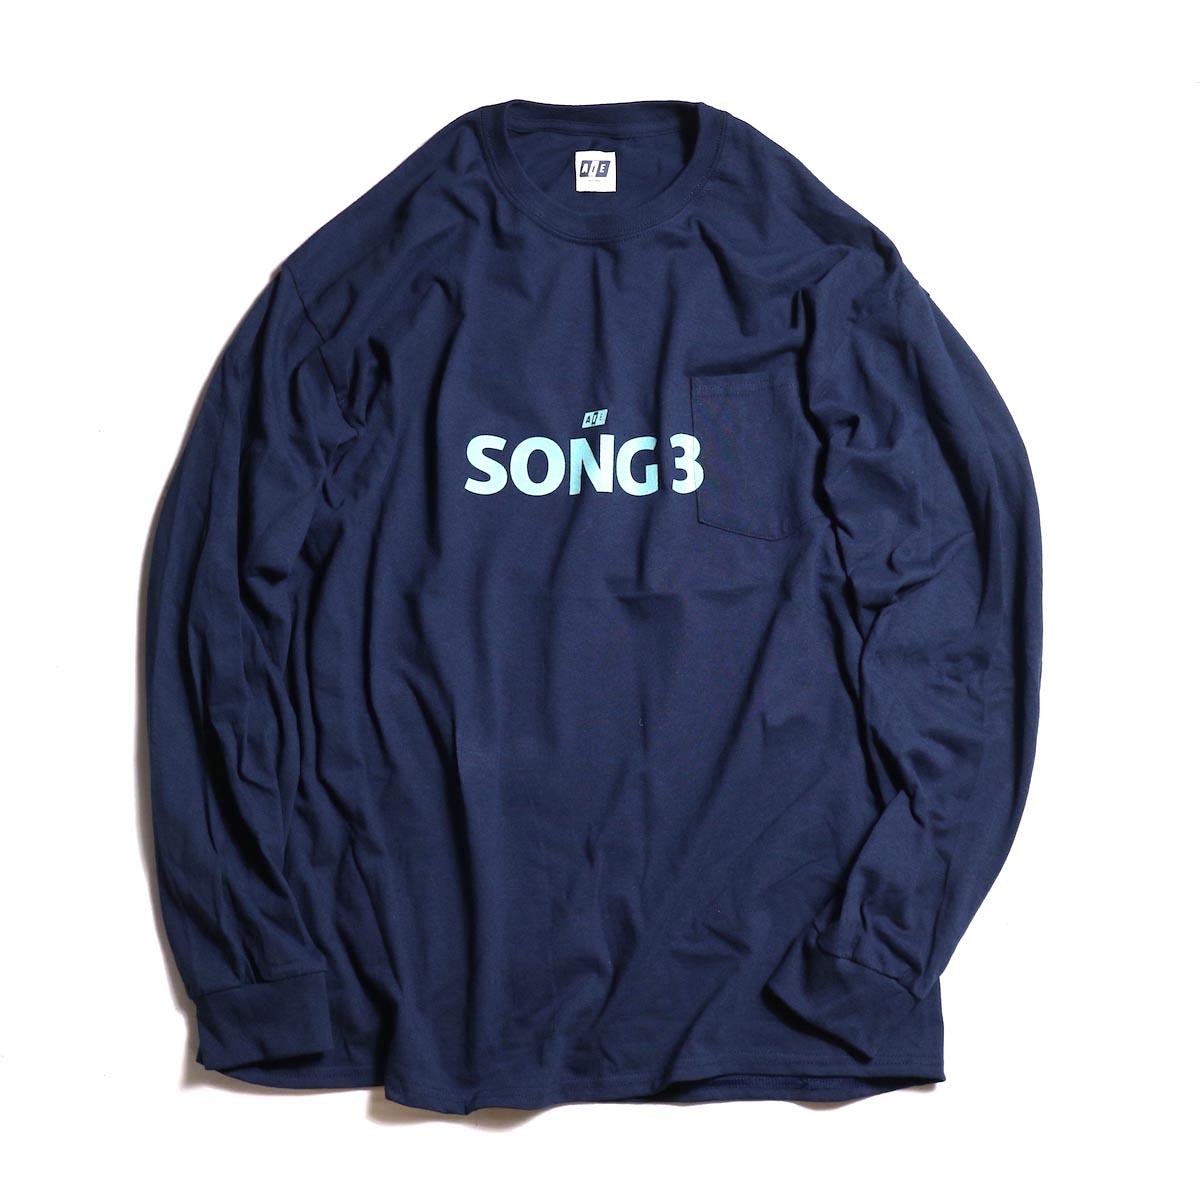 AiE / BIG CREW NECK SWEAT - SONG 3AiE / Big L/S Pocket T-shirt - Song3 -Navy